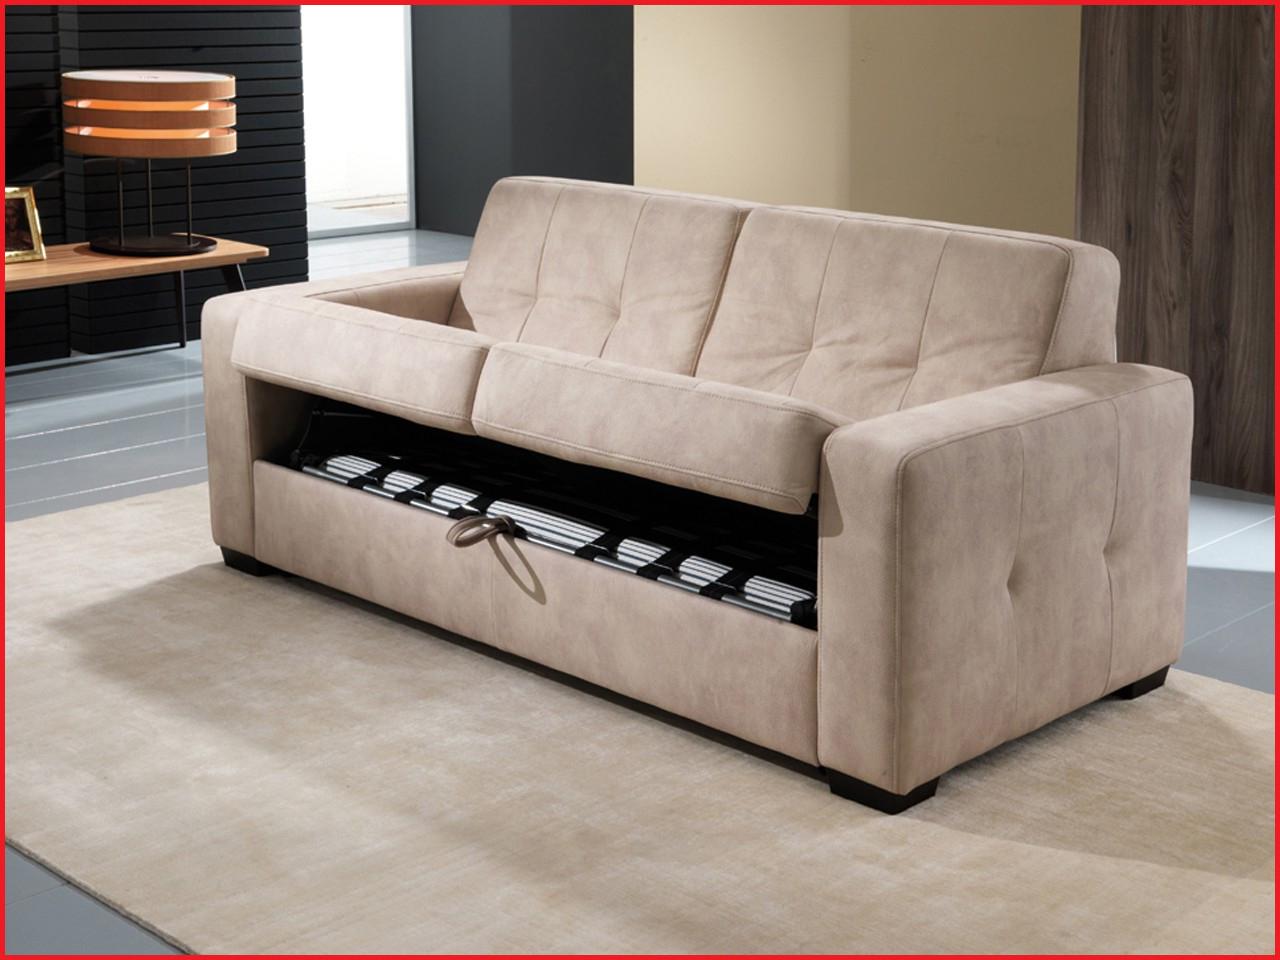 Dicoro sofas Irdz sofa Cama Barato Madrid sofa Cama Barato Y sofas Cama Dicoro